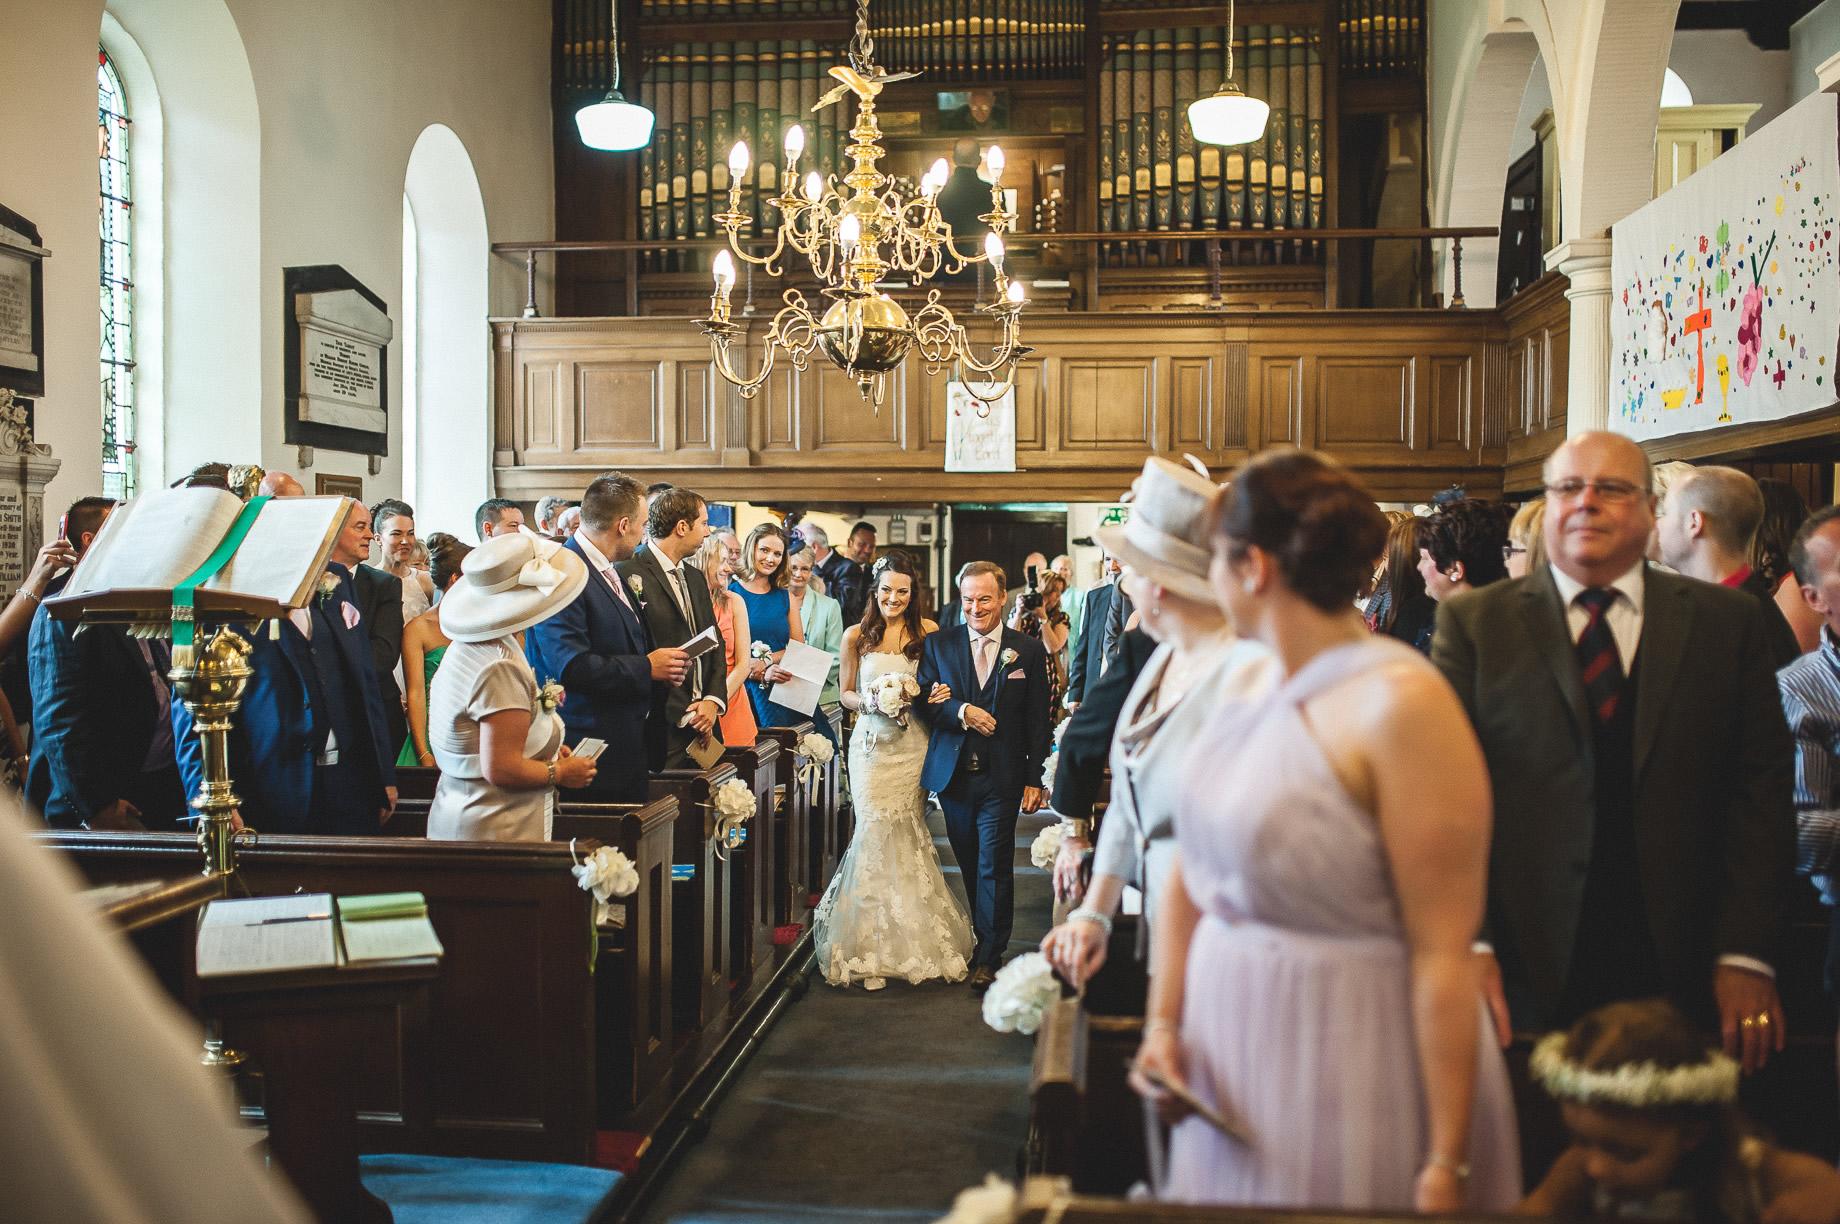 Helen and Matt's Wedding at Mitton Hall 038